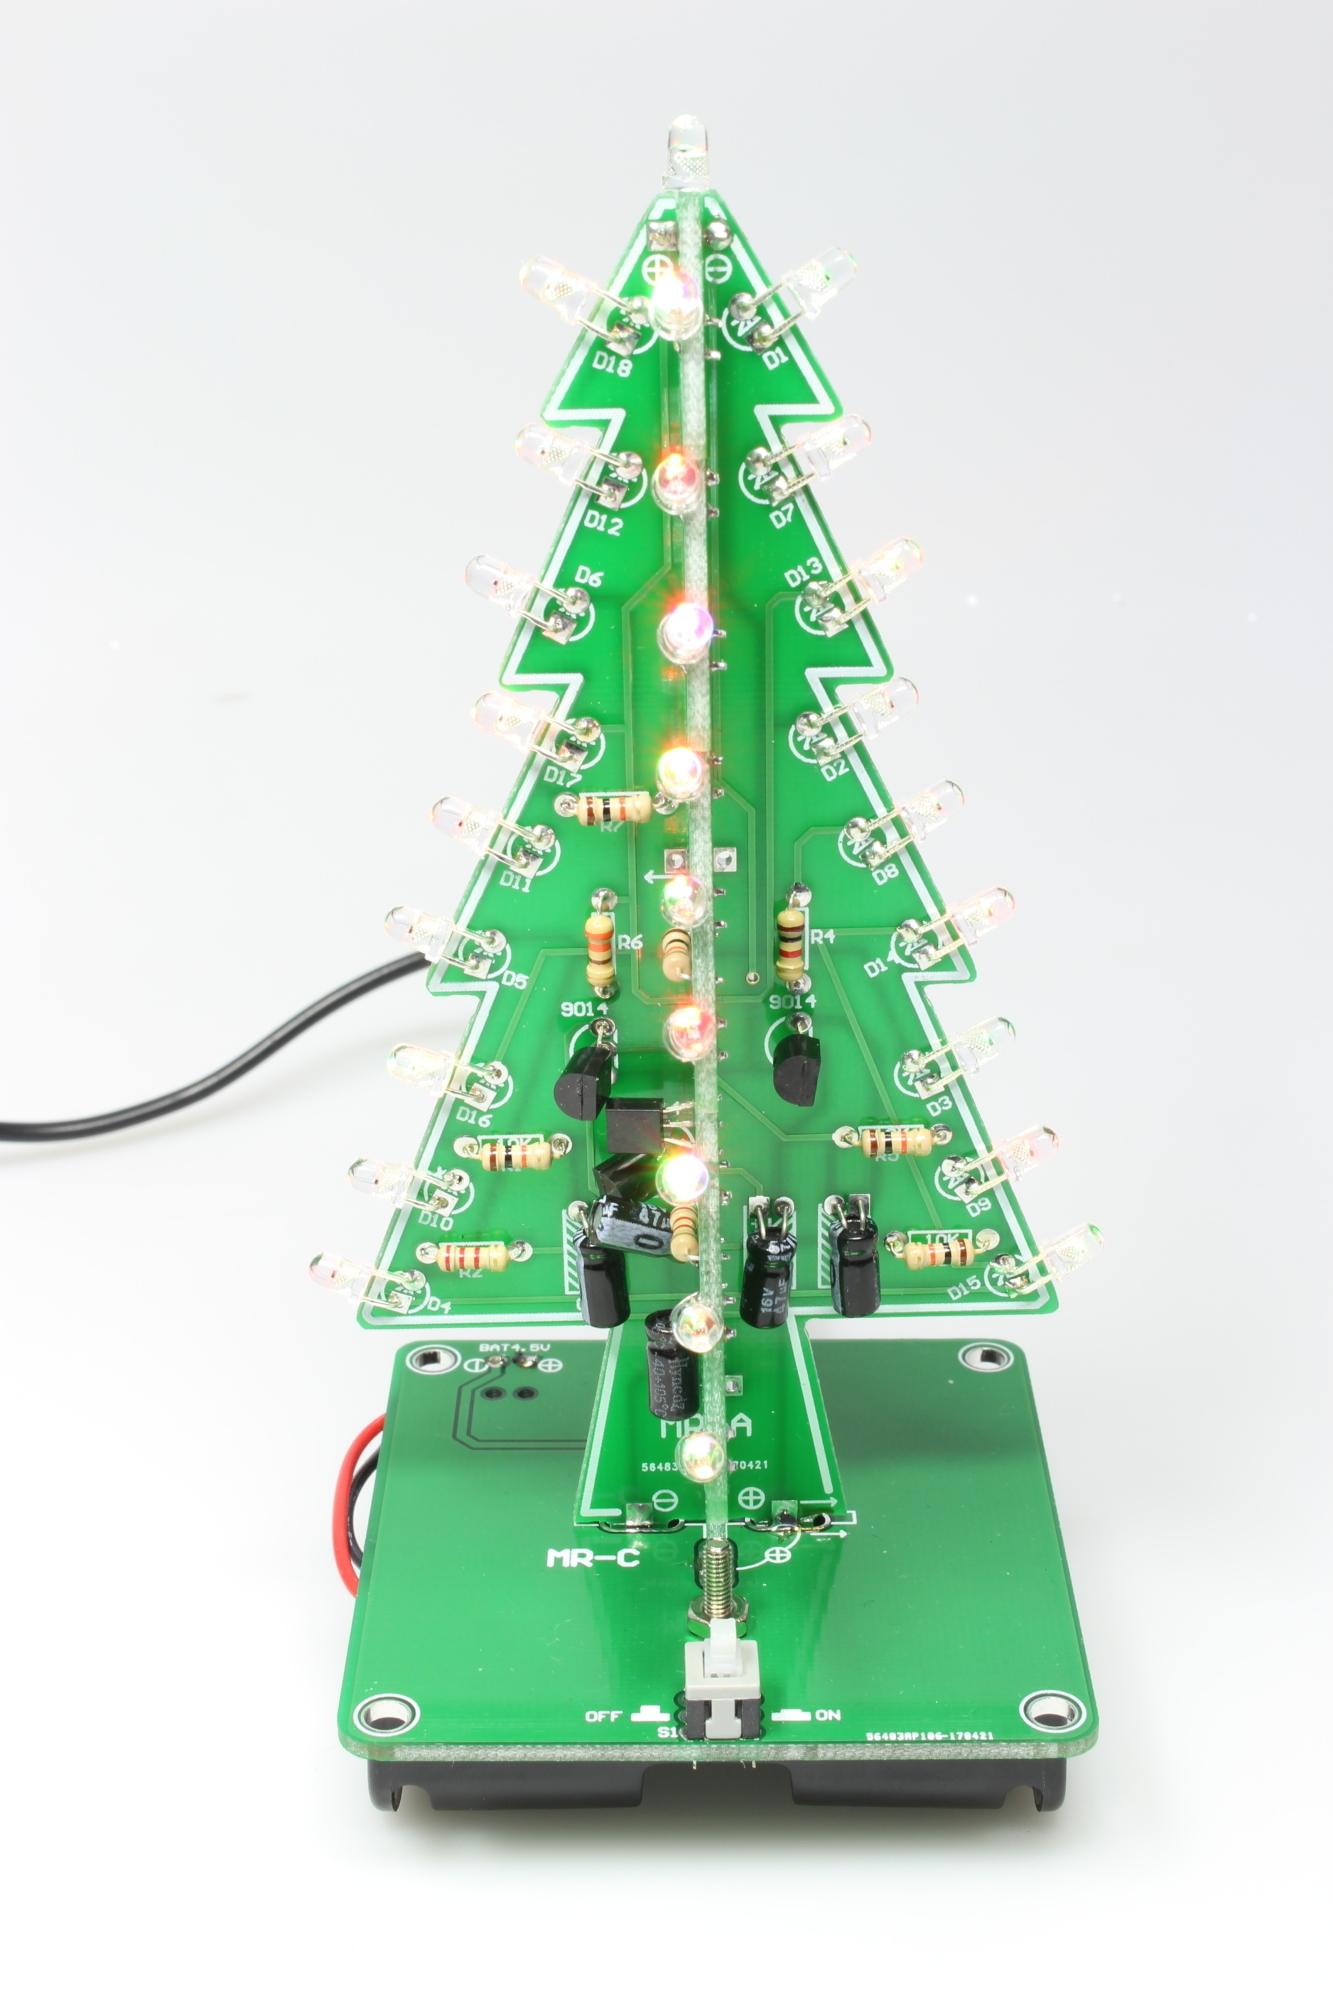 tischdeko blinkender led weihnachtsbaum make. Black Bedroom Furniture Sets. Home Design Ideas